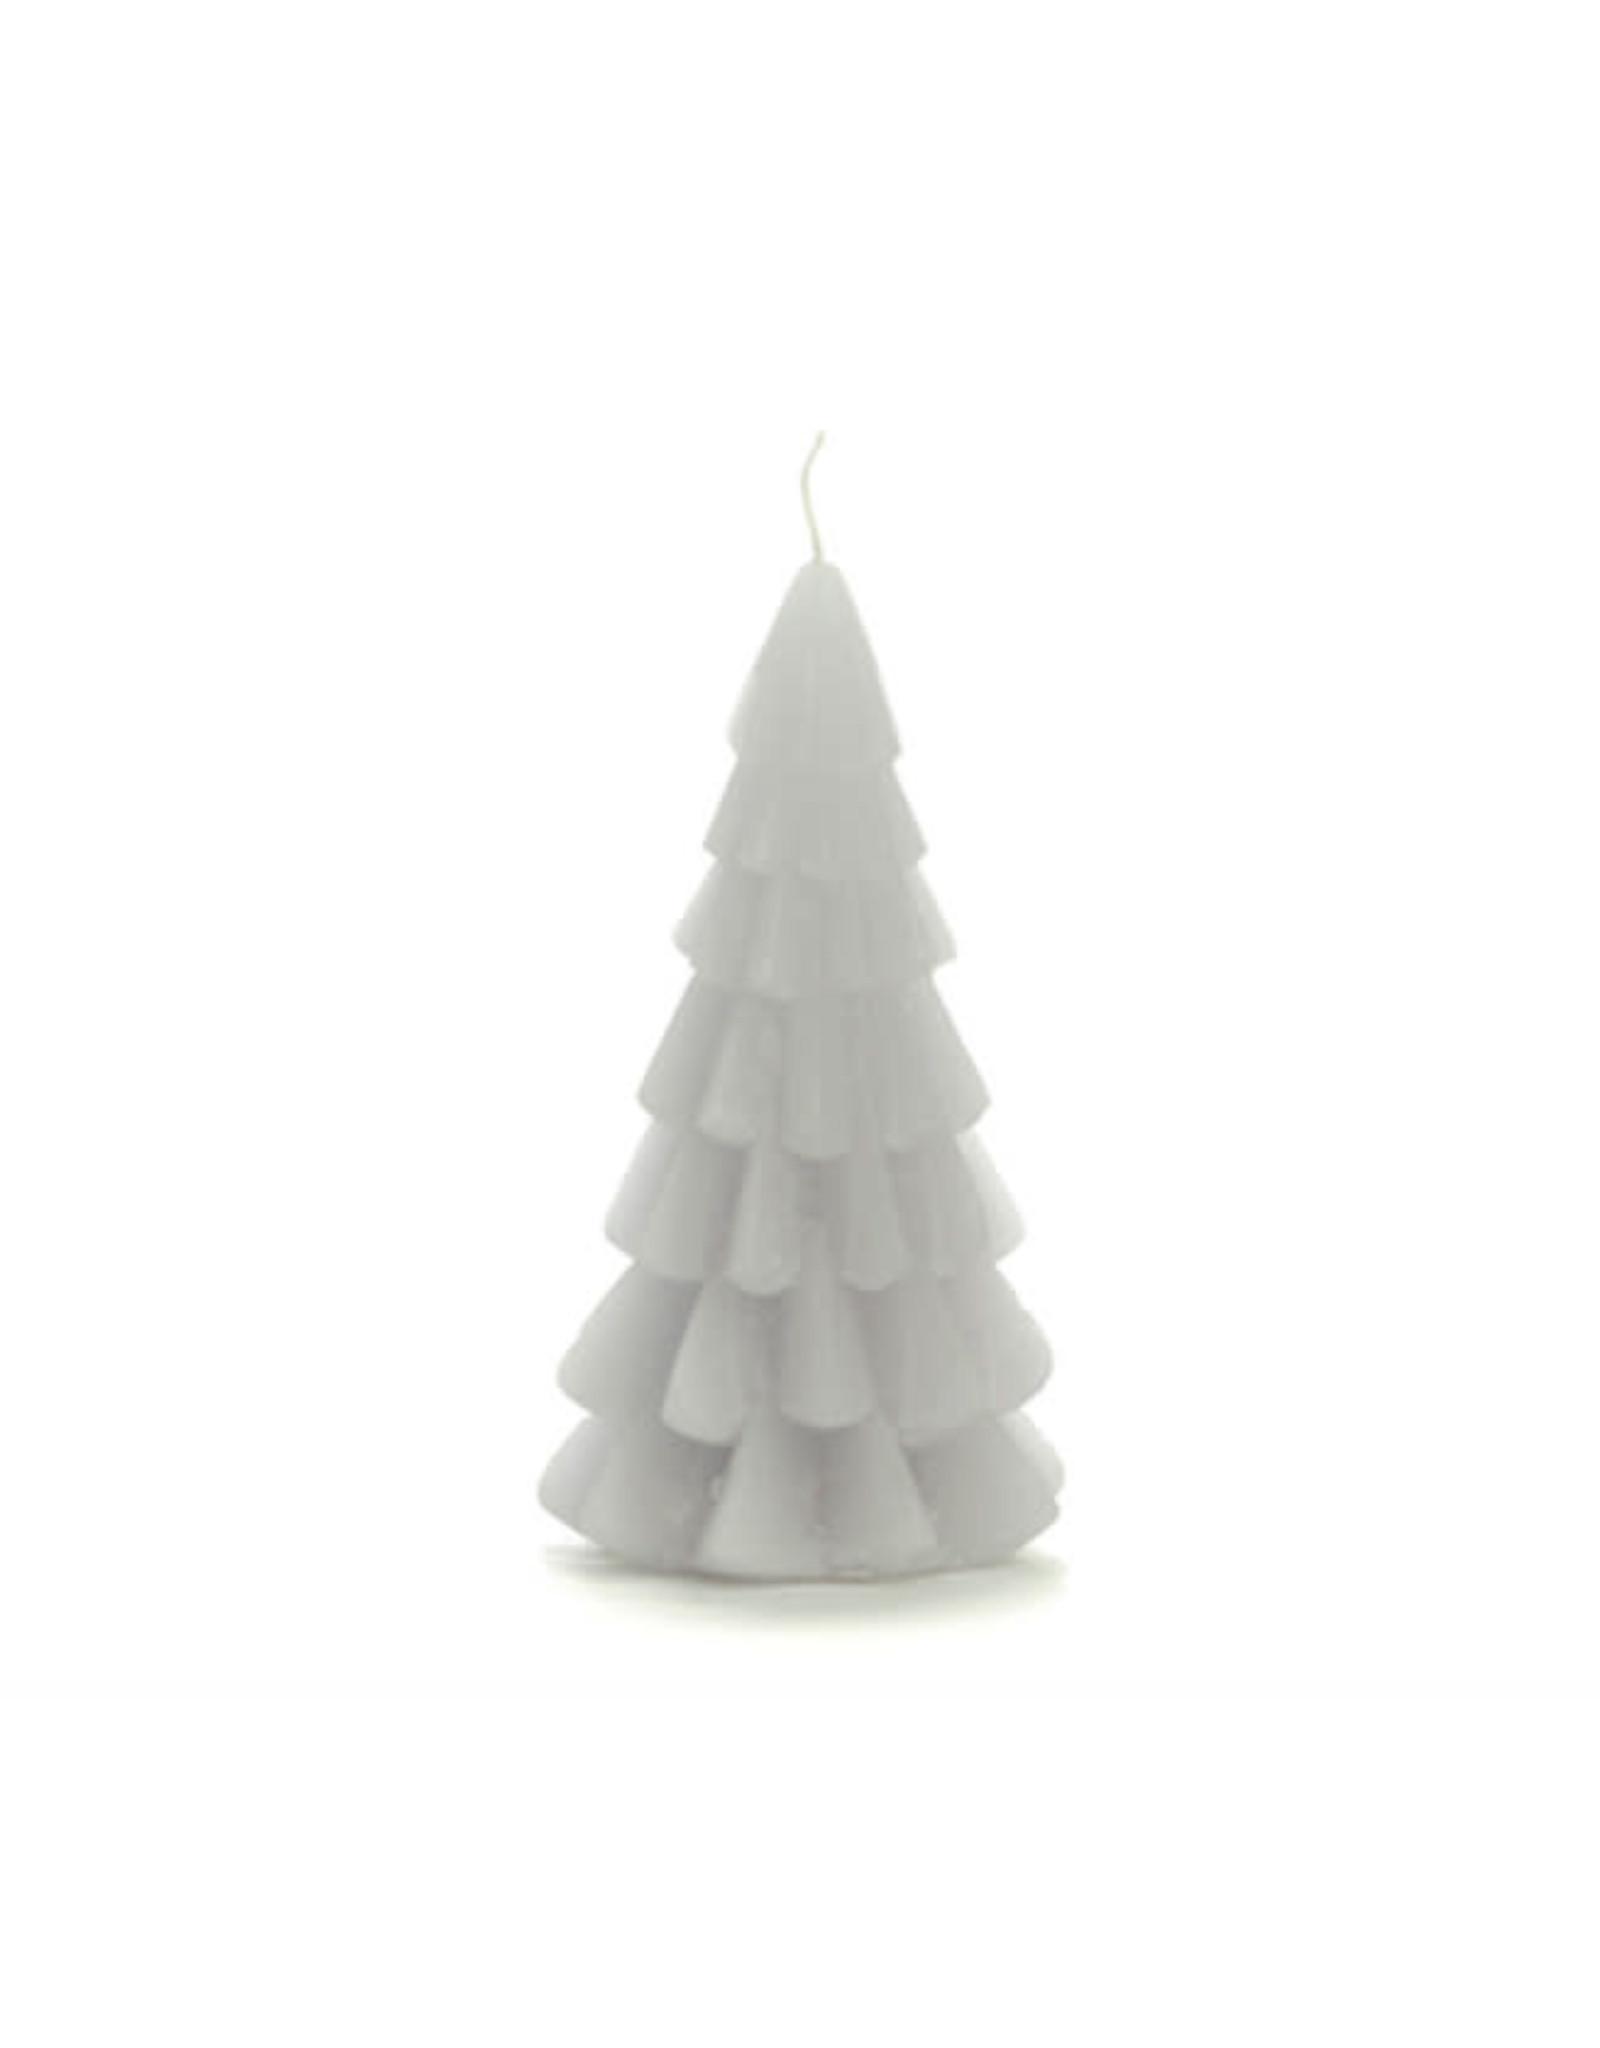 Rustik Lys Xmas Tree Candle 6x12cm-cool grey